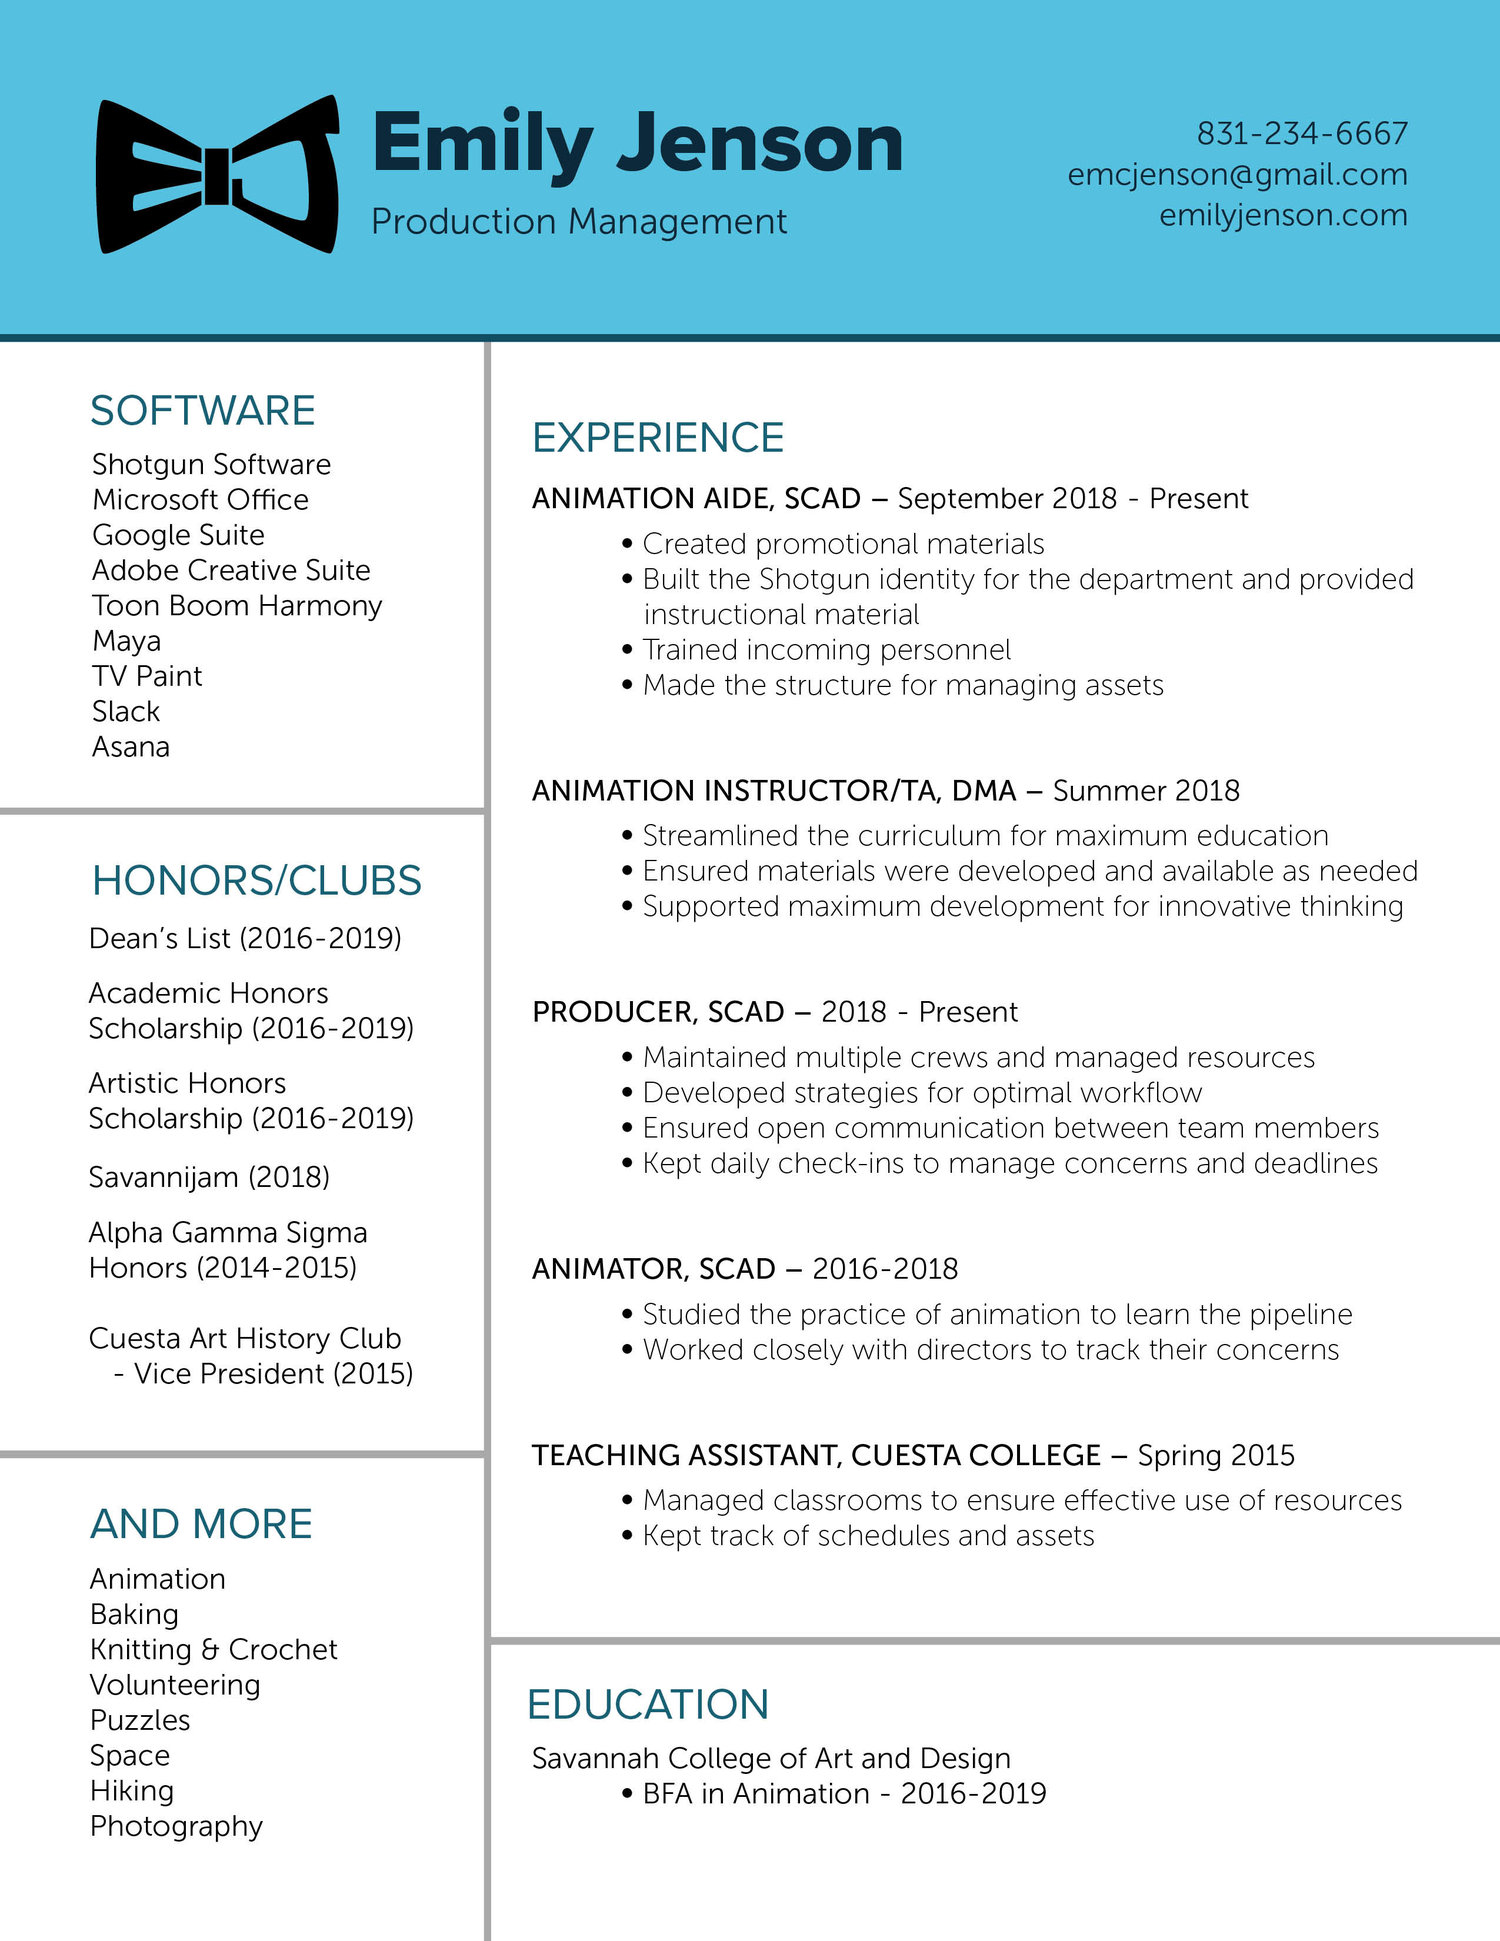 Resume — Emily Jenson